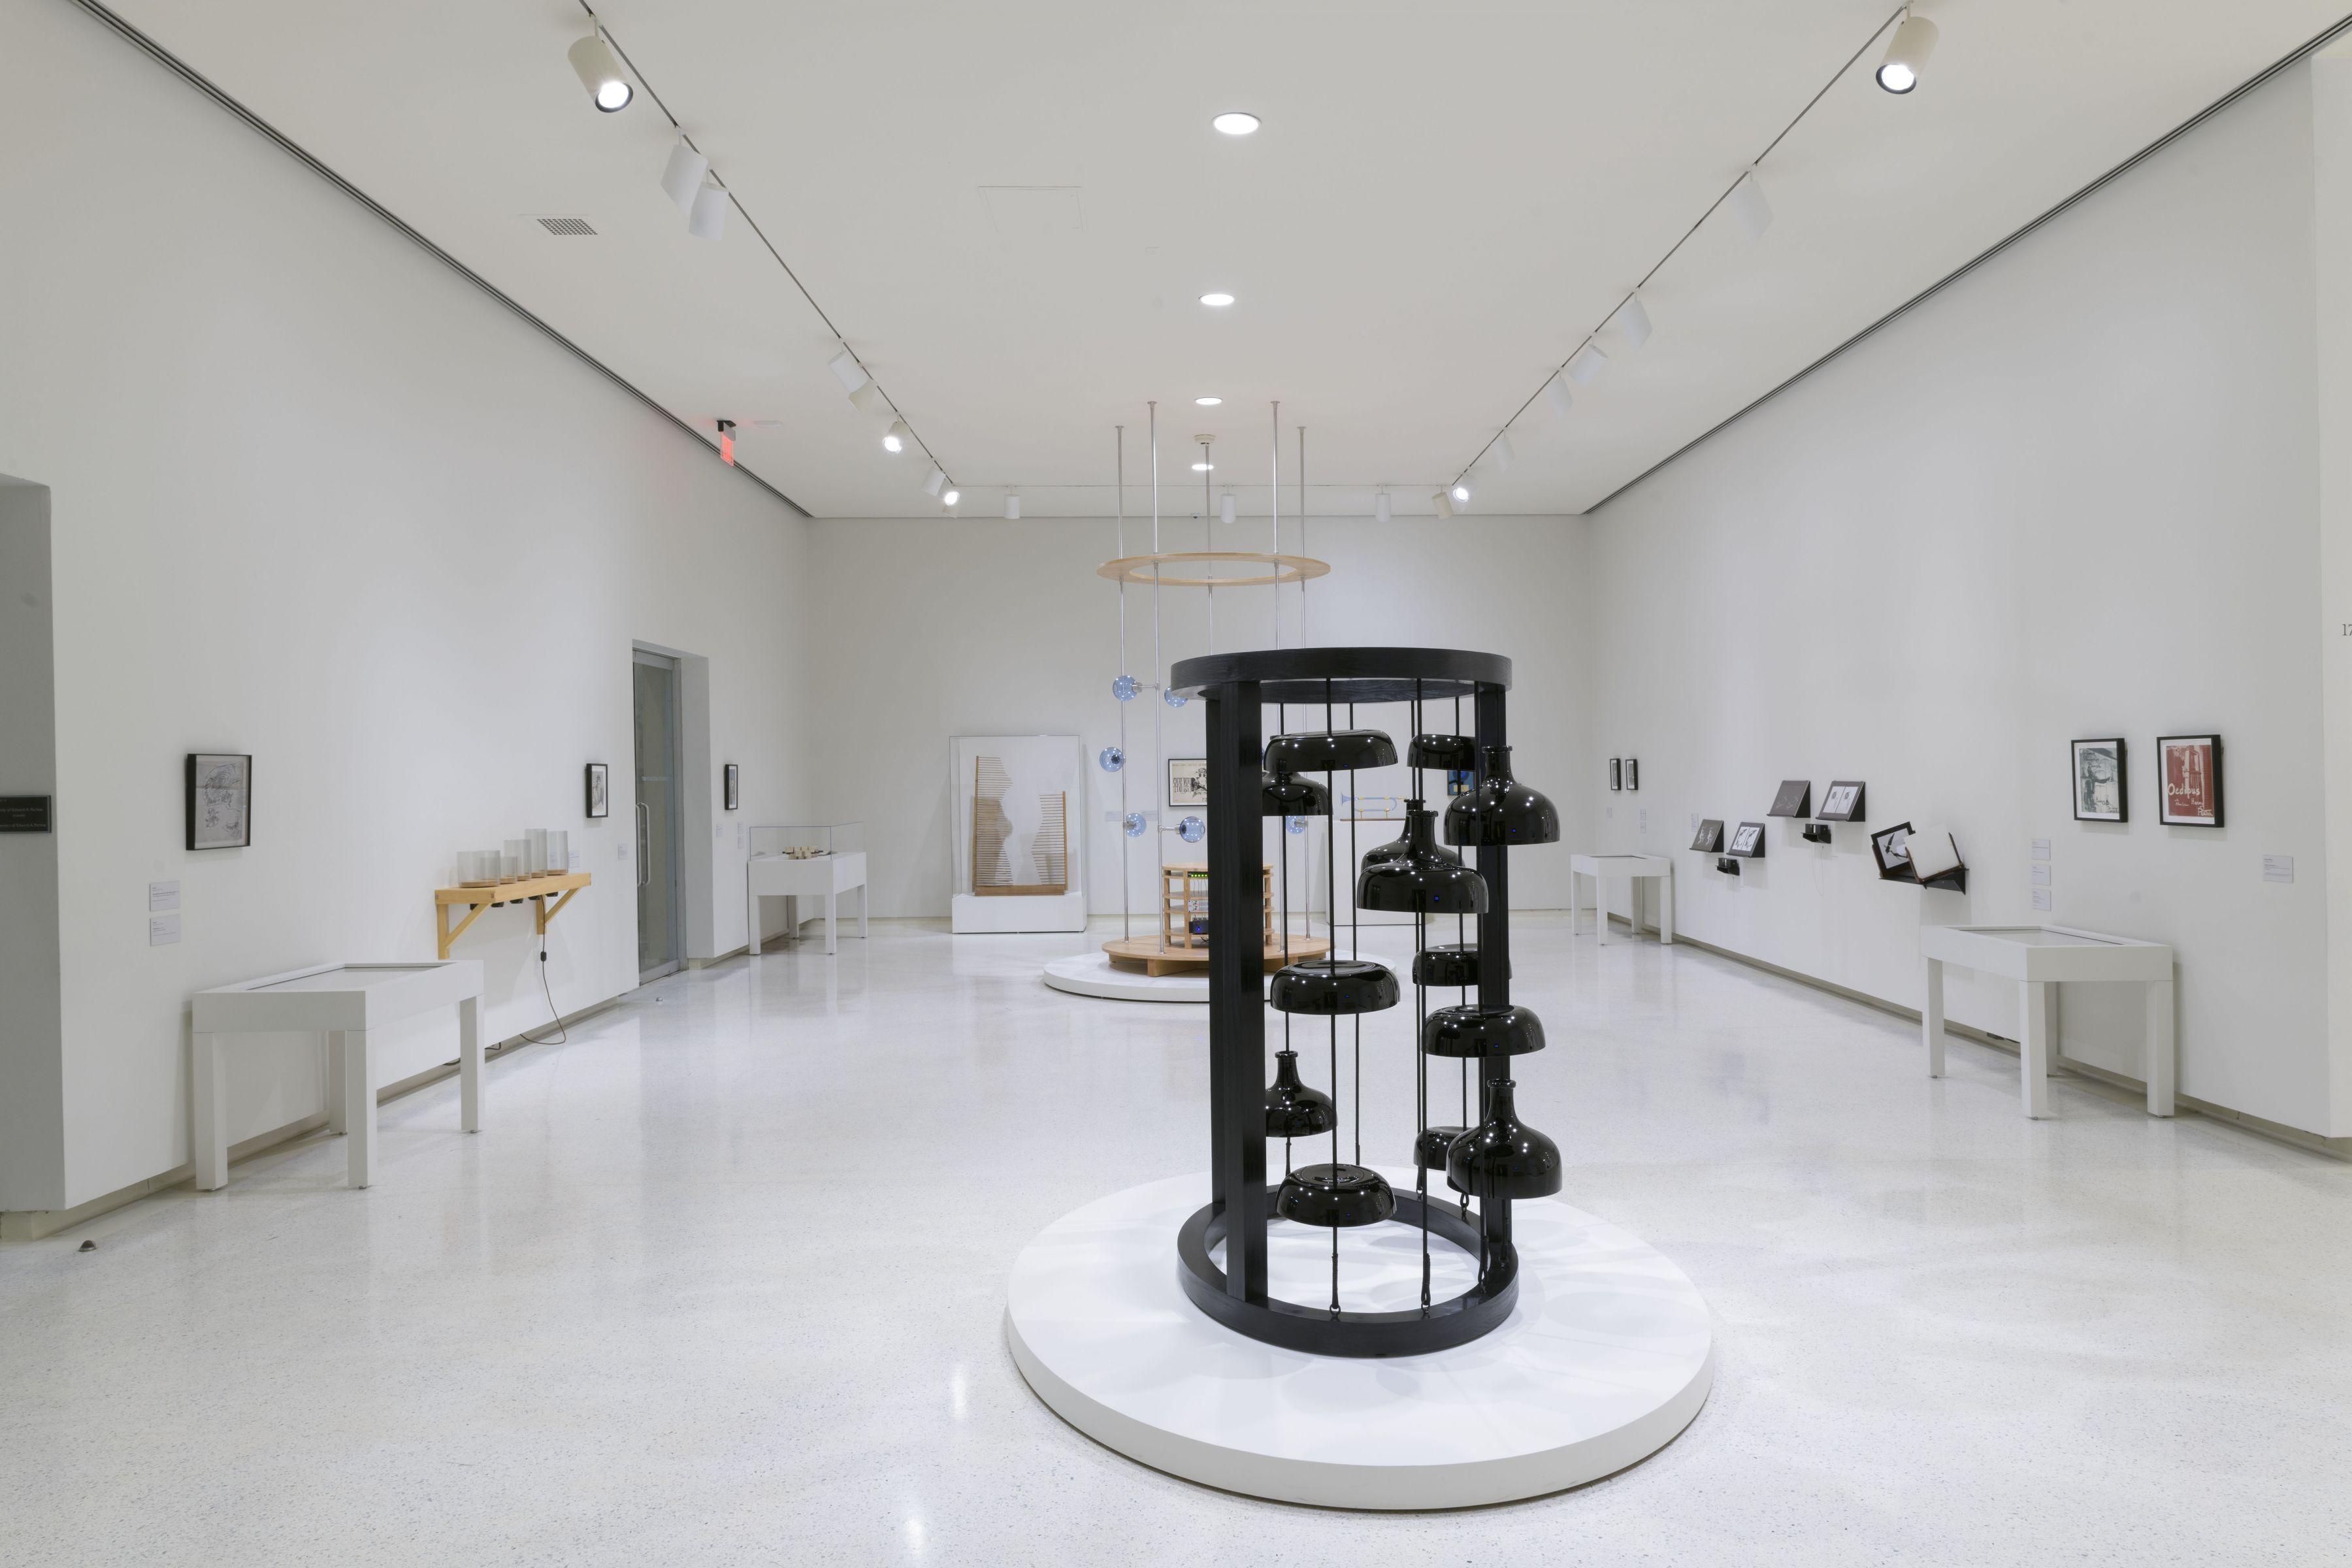 JOSIAH McELHENY, Installation view: 57th Carnegie International, Carnegie Museum of Art, Pittsburgh, PA, 13 October 2018 - 25 March2019